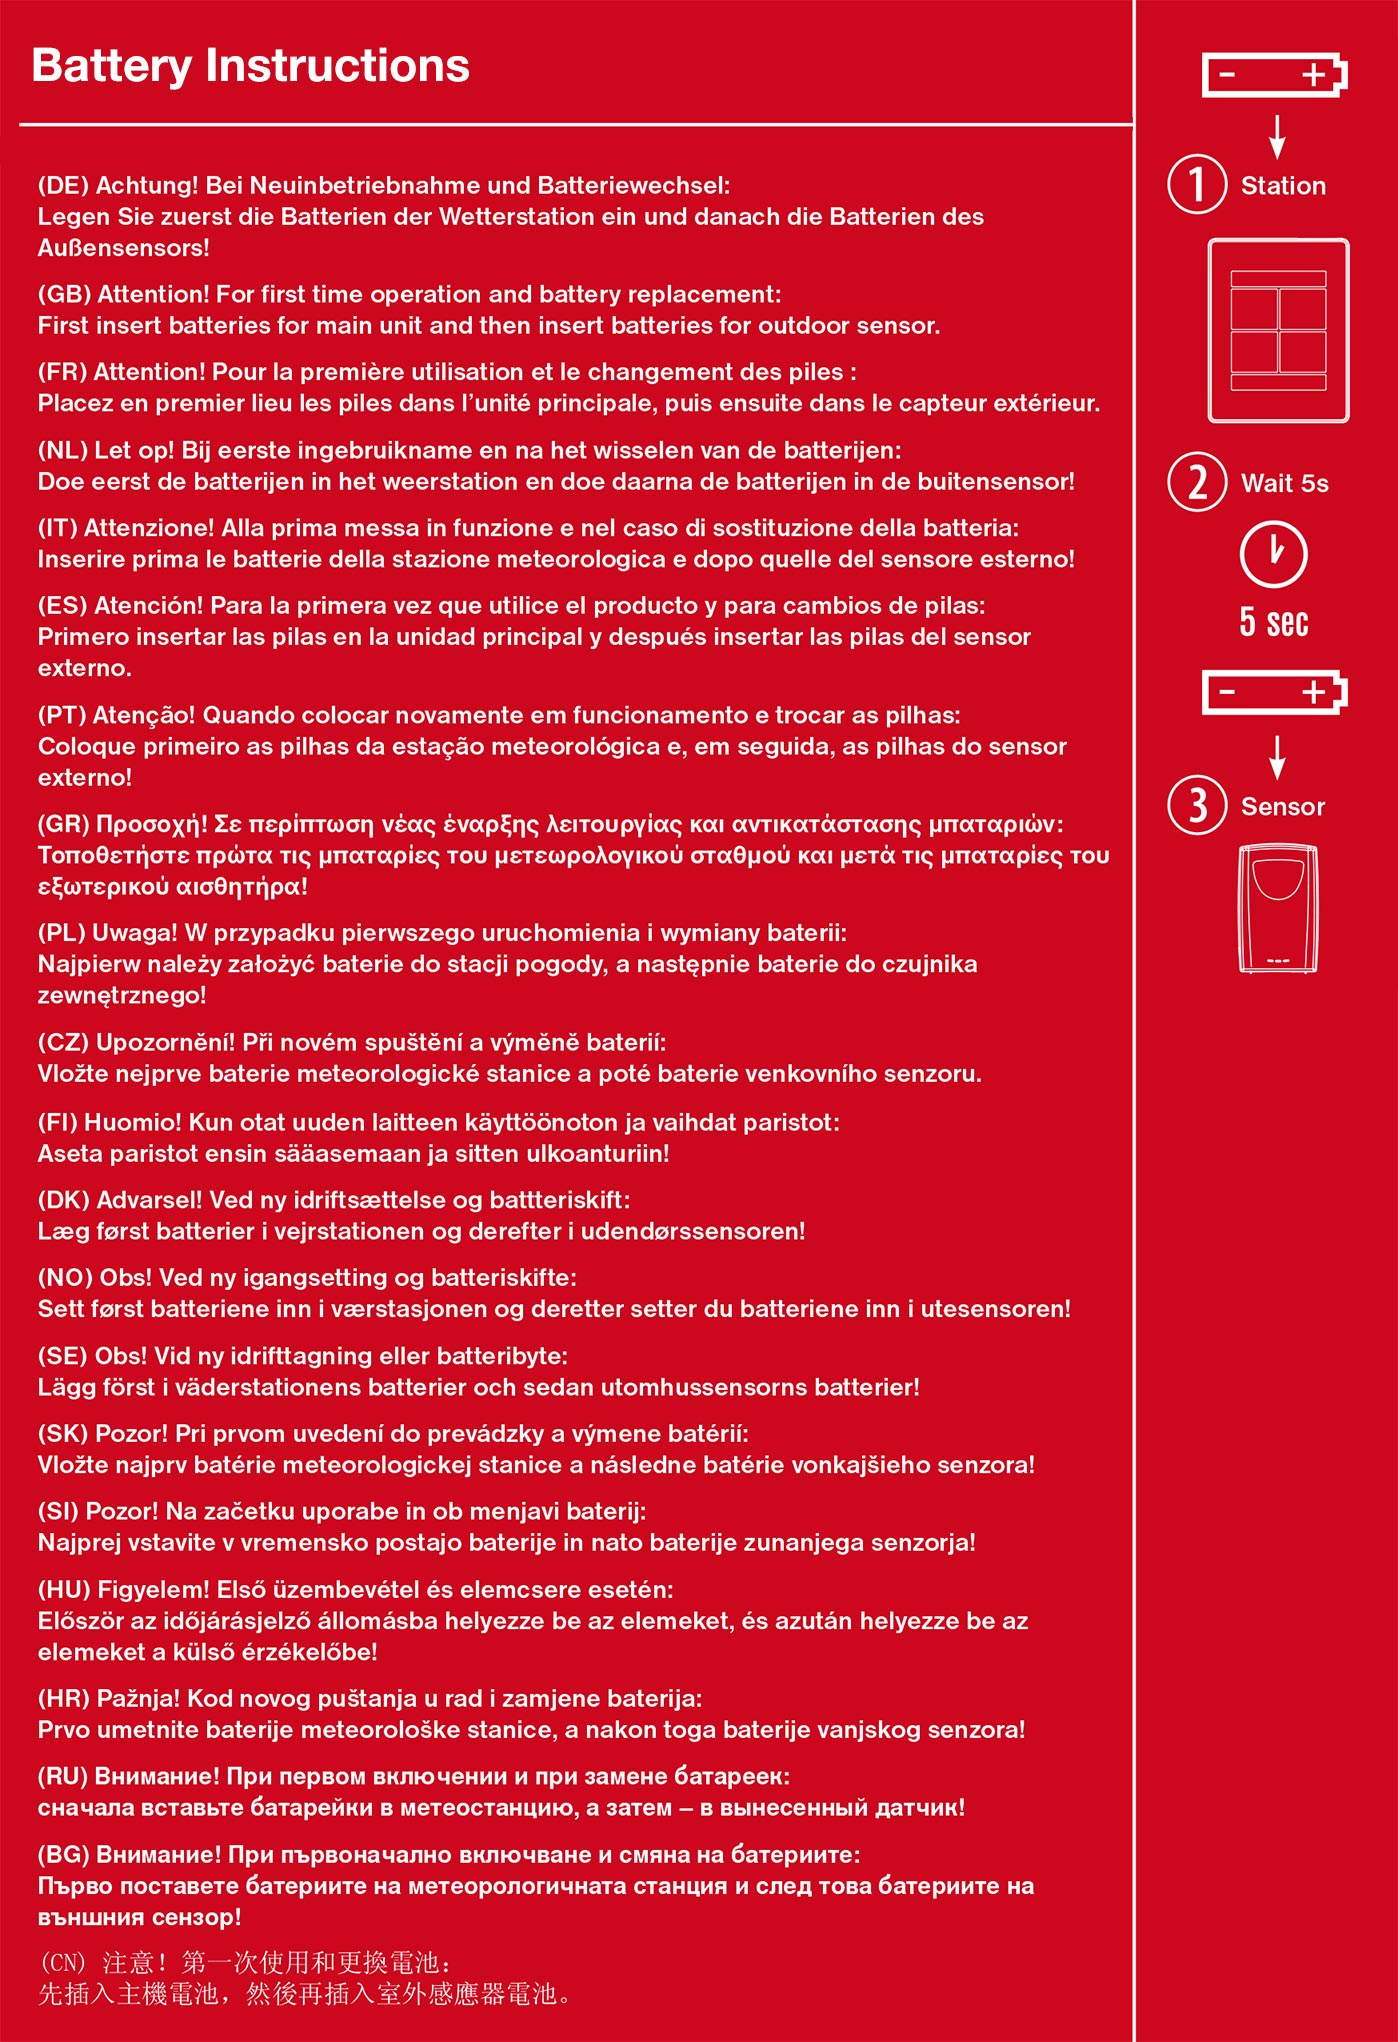 Batterie Anweisungen